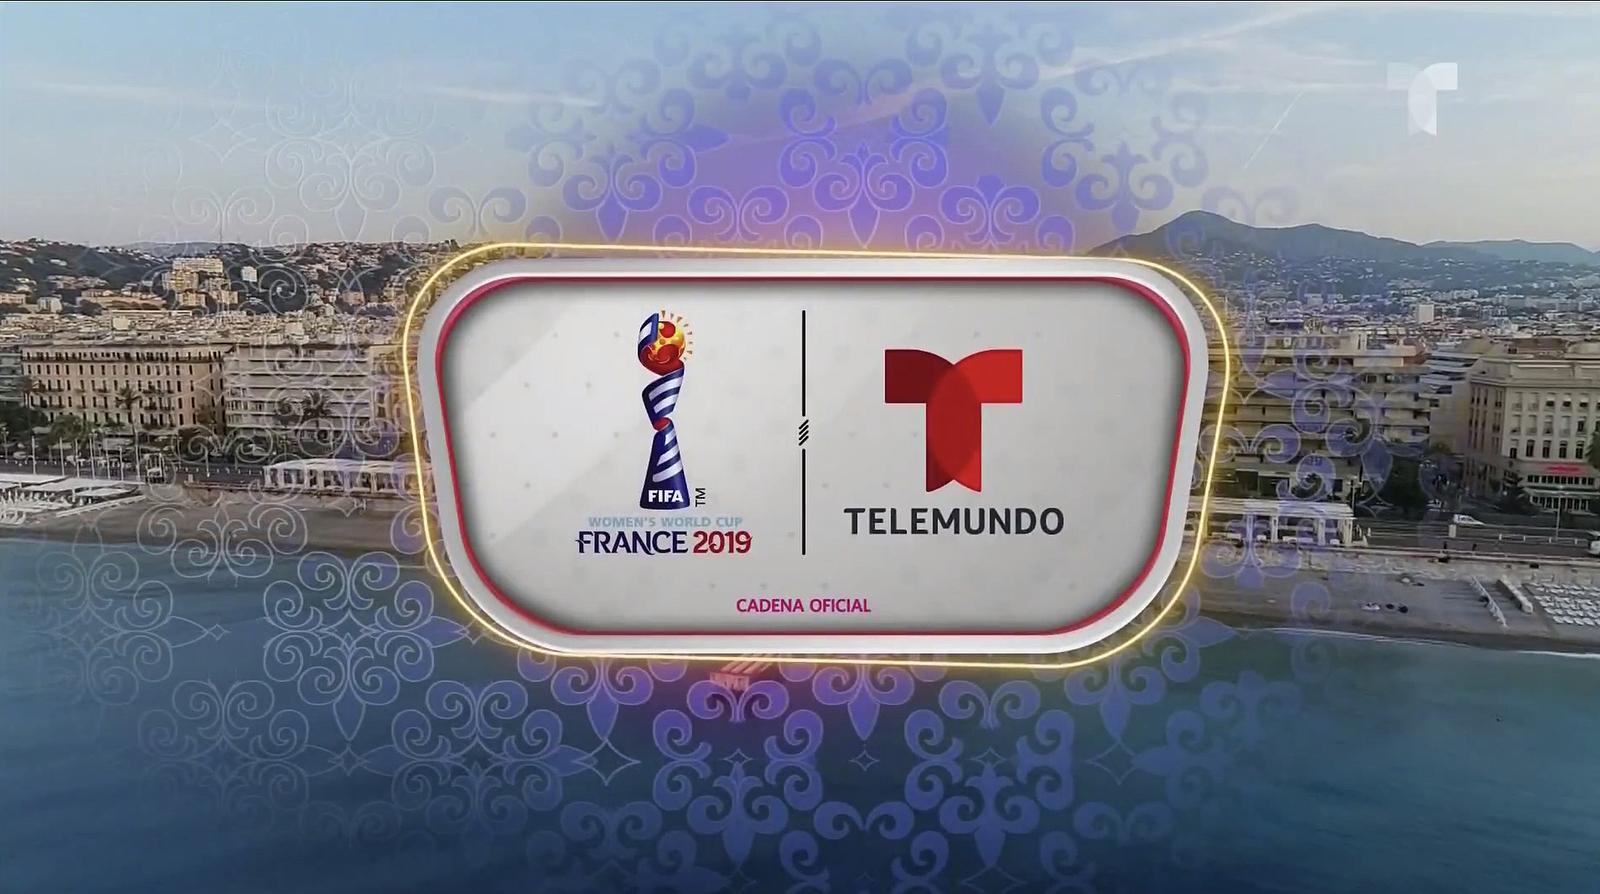 NCS_Telemundo-FIFA-Womens-World-Cup-2019_GFX_0030